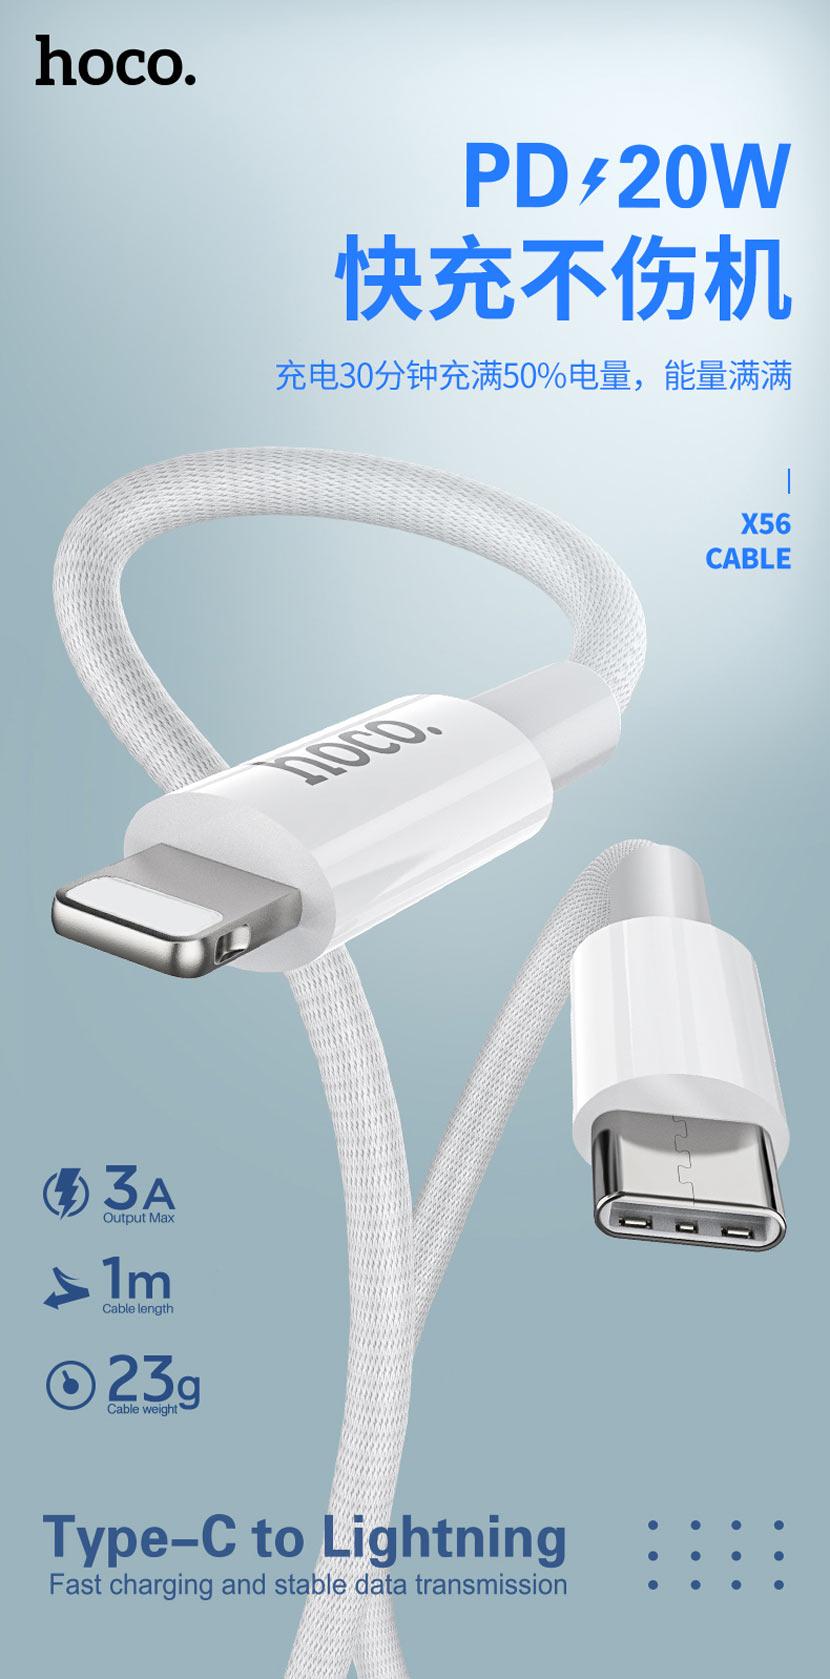 hoco news x56 new original pd charging data cable lightning cn